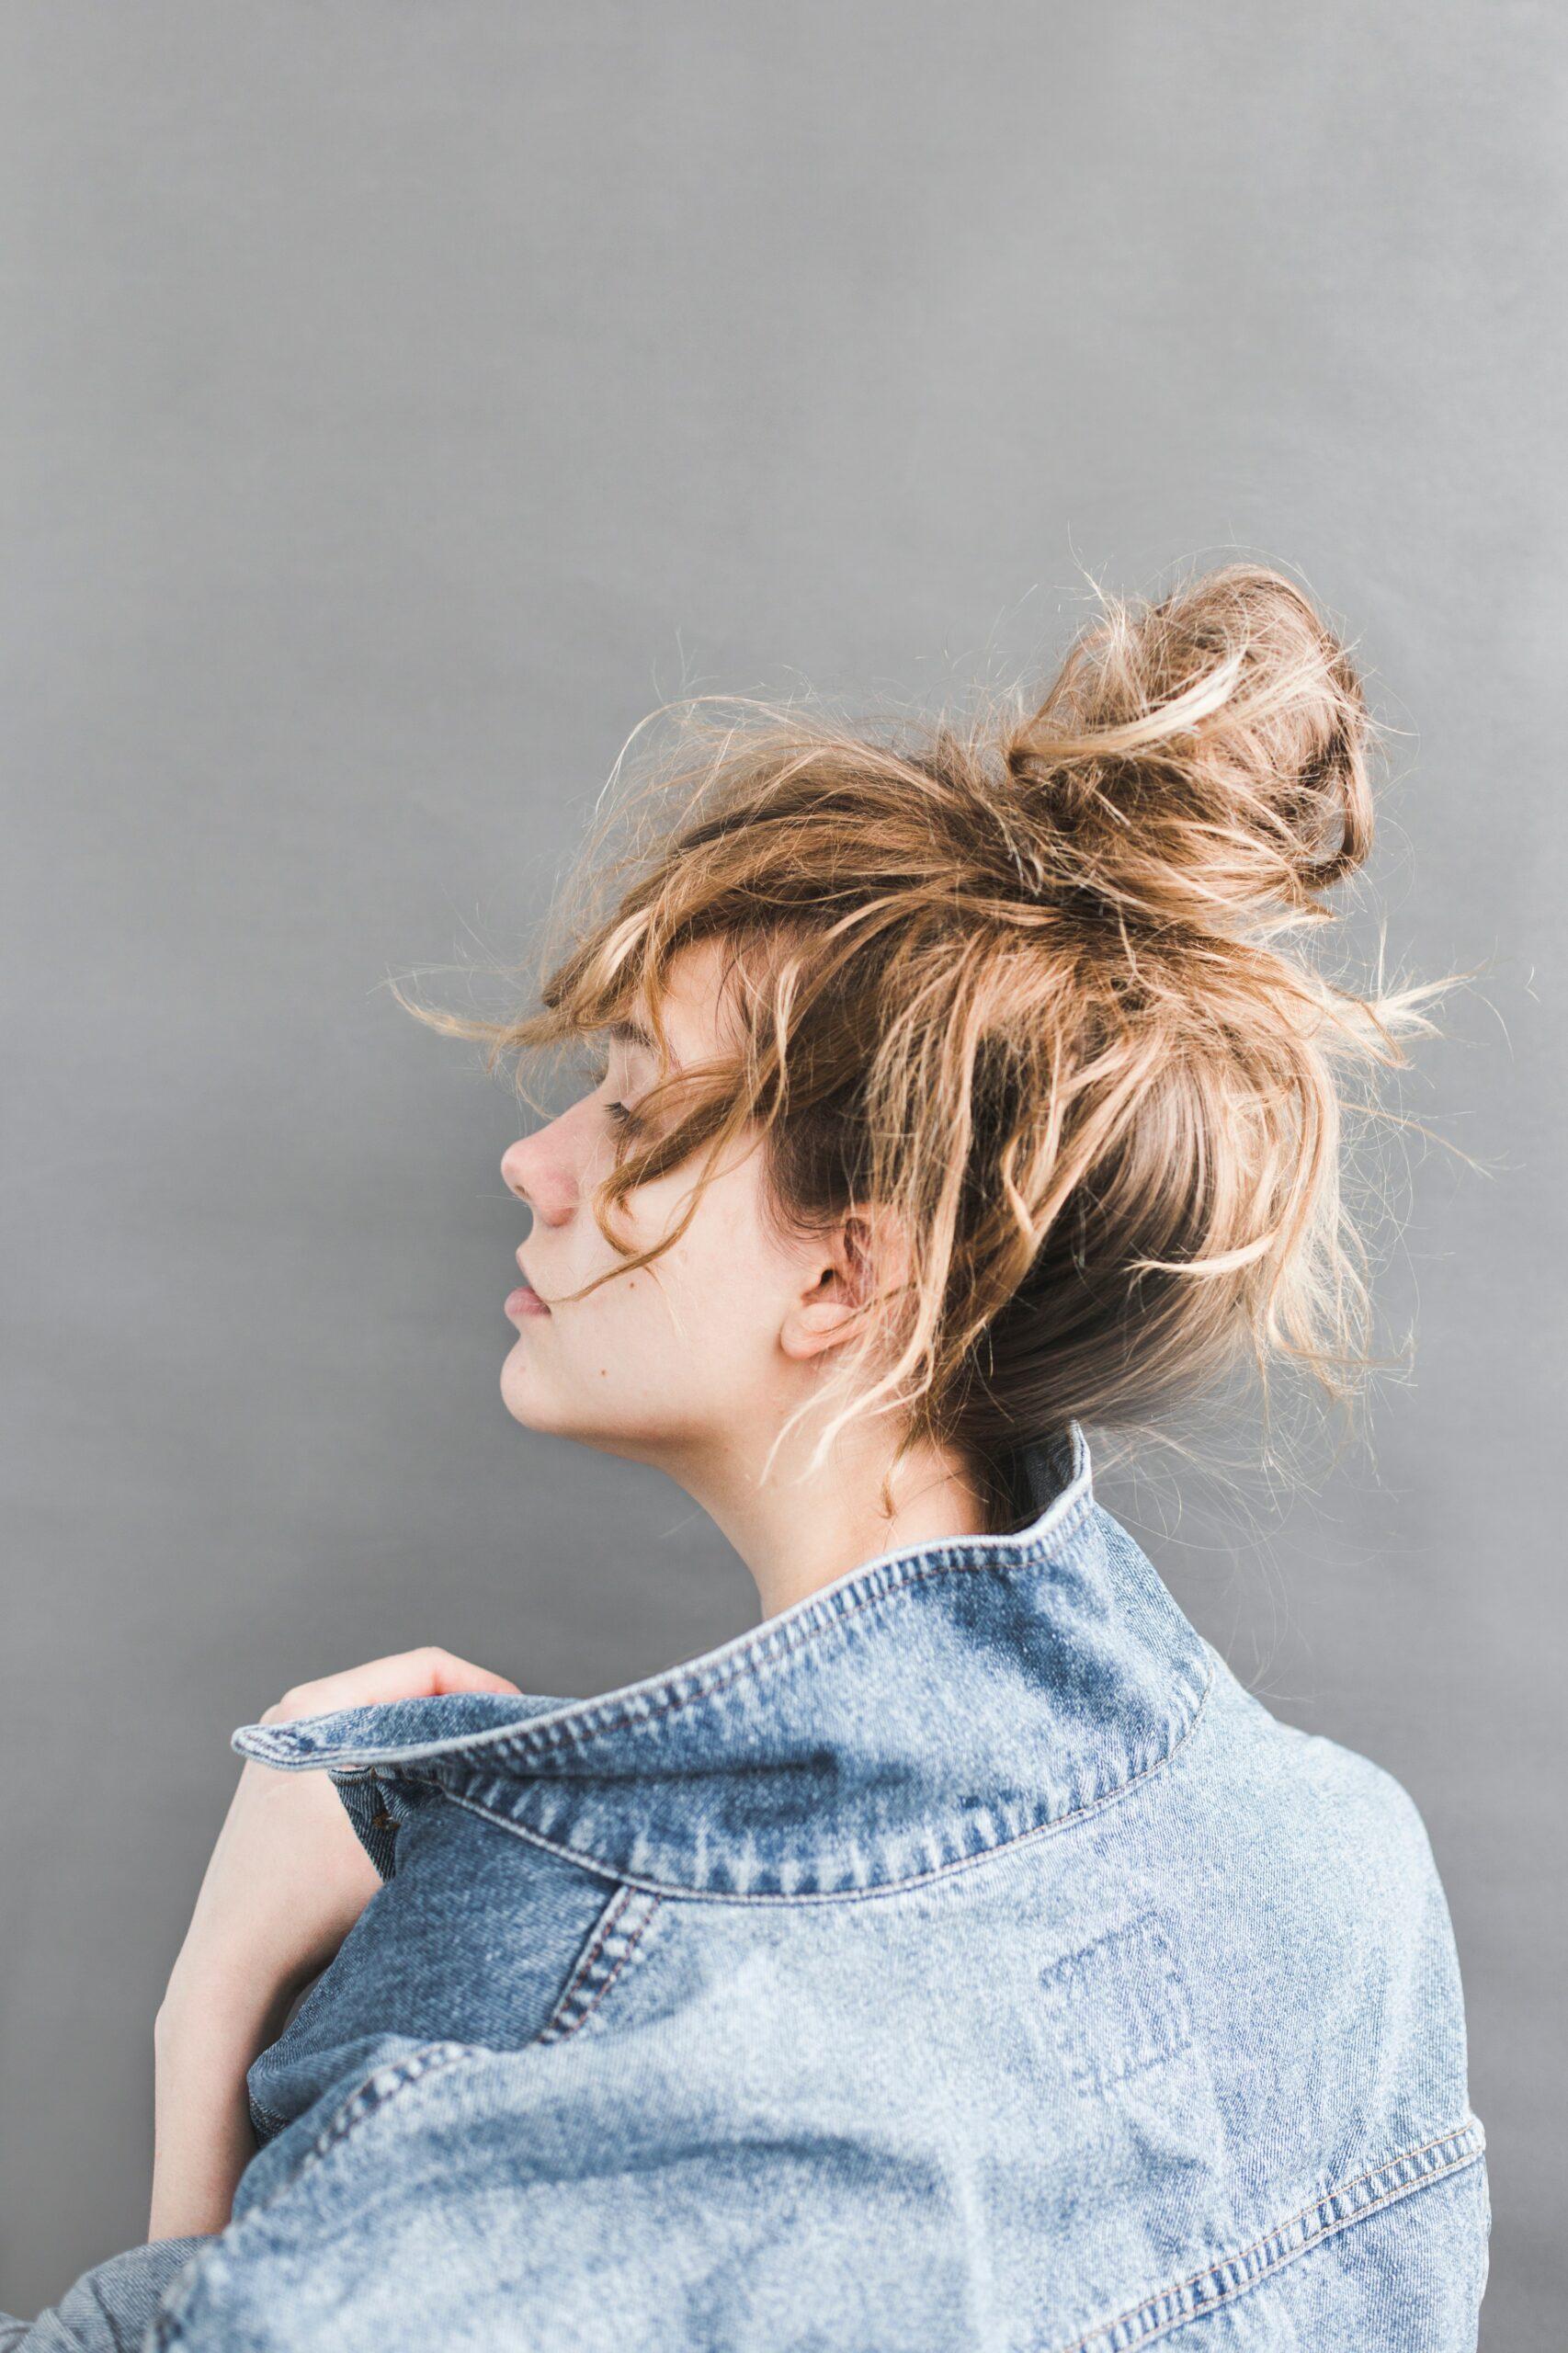 Online workshop hairstyling | Online workshops